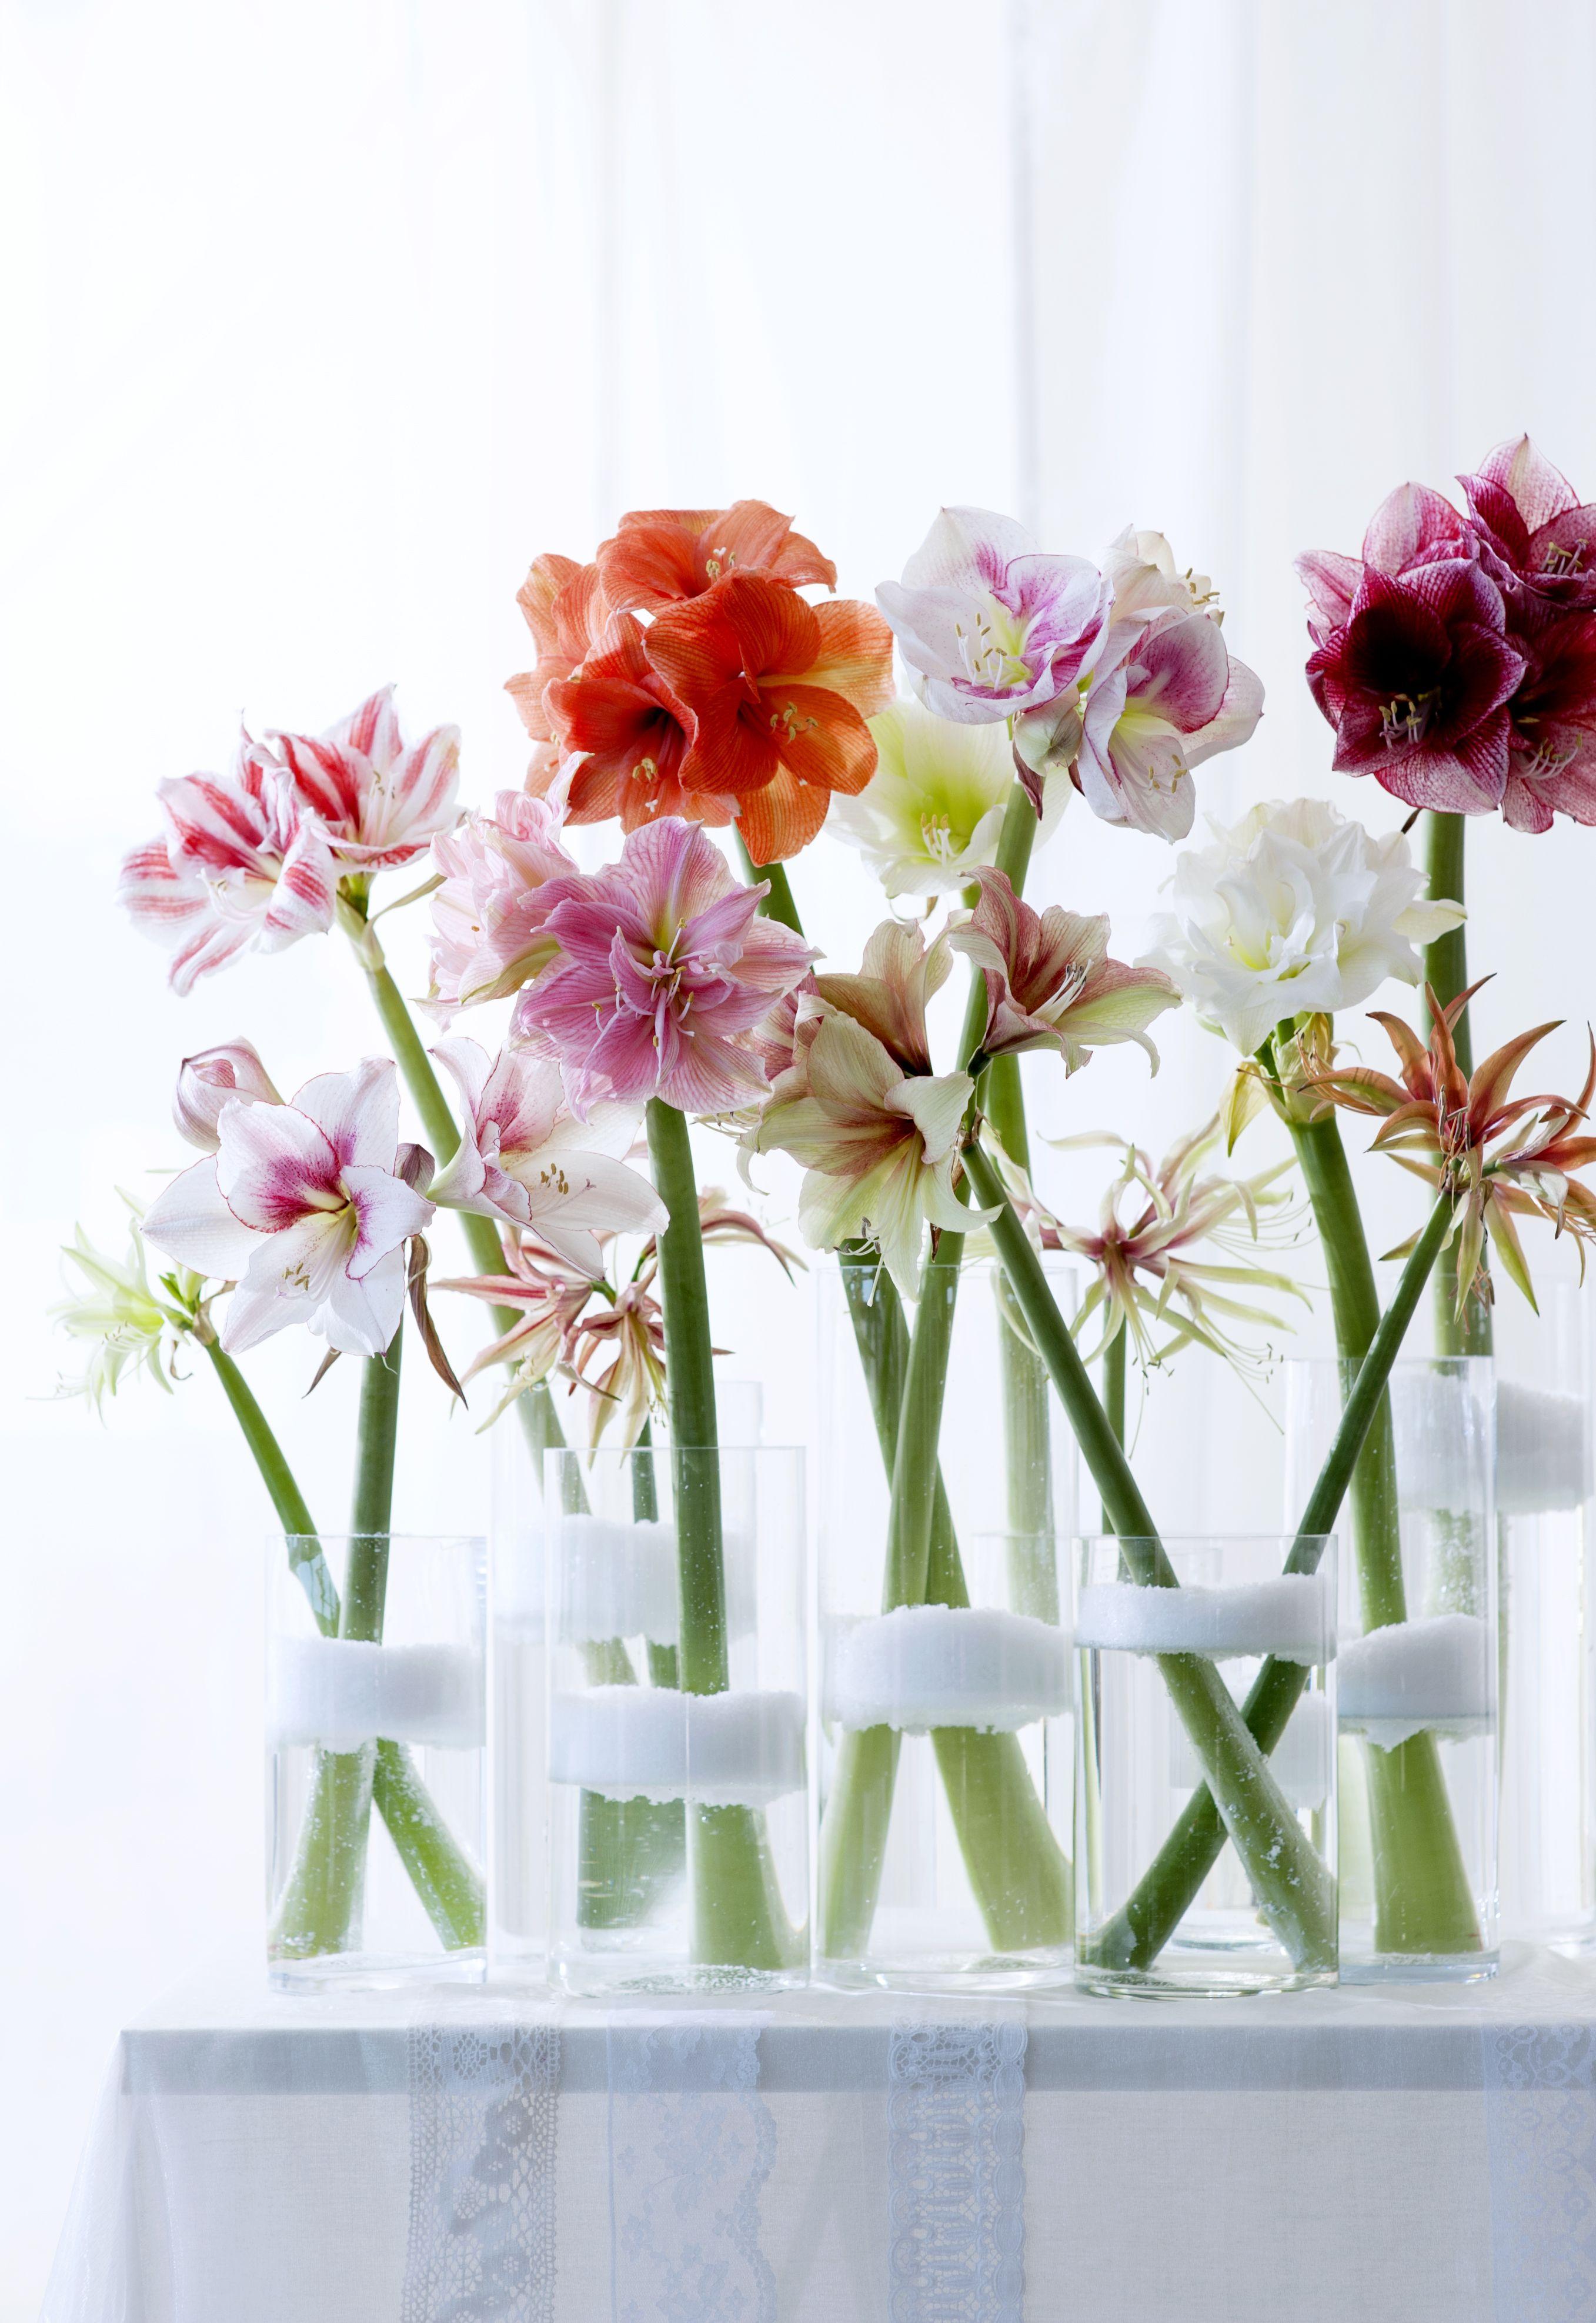 Www Tollwasblumenmachen De Amaryllis And Paperwhites And Bulbs